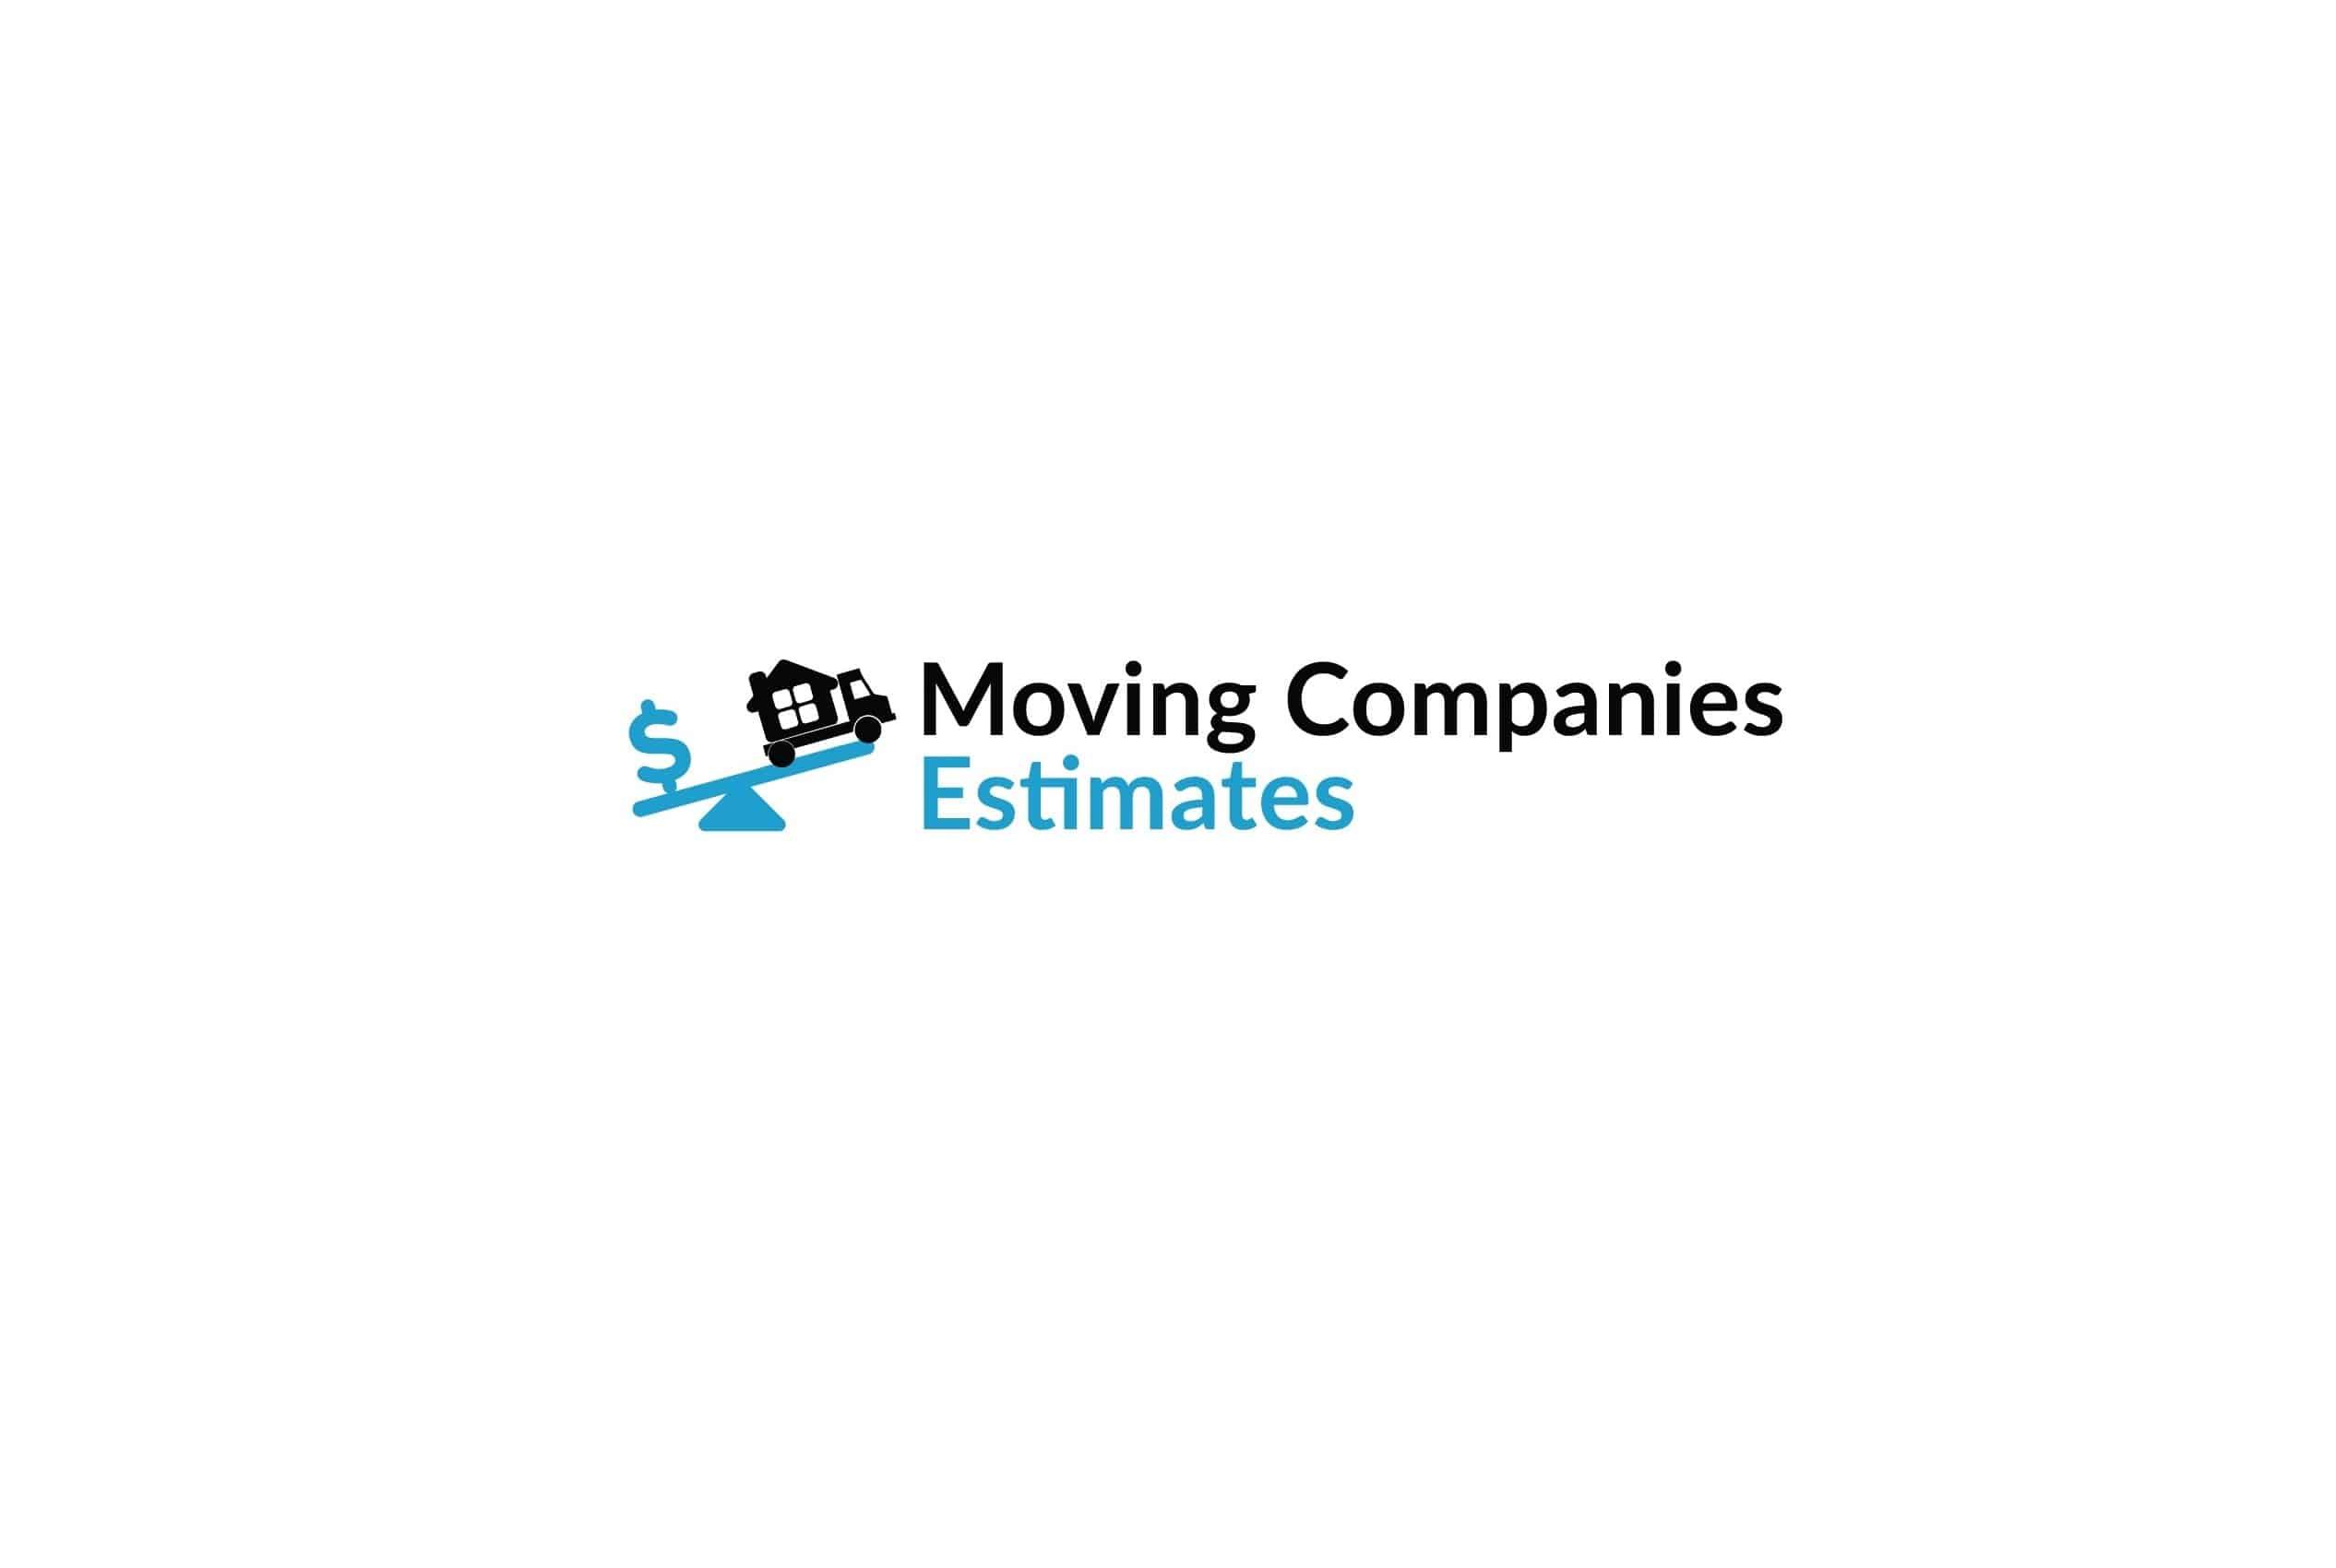 Moving-Company-Estimates1500x1700.jpg